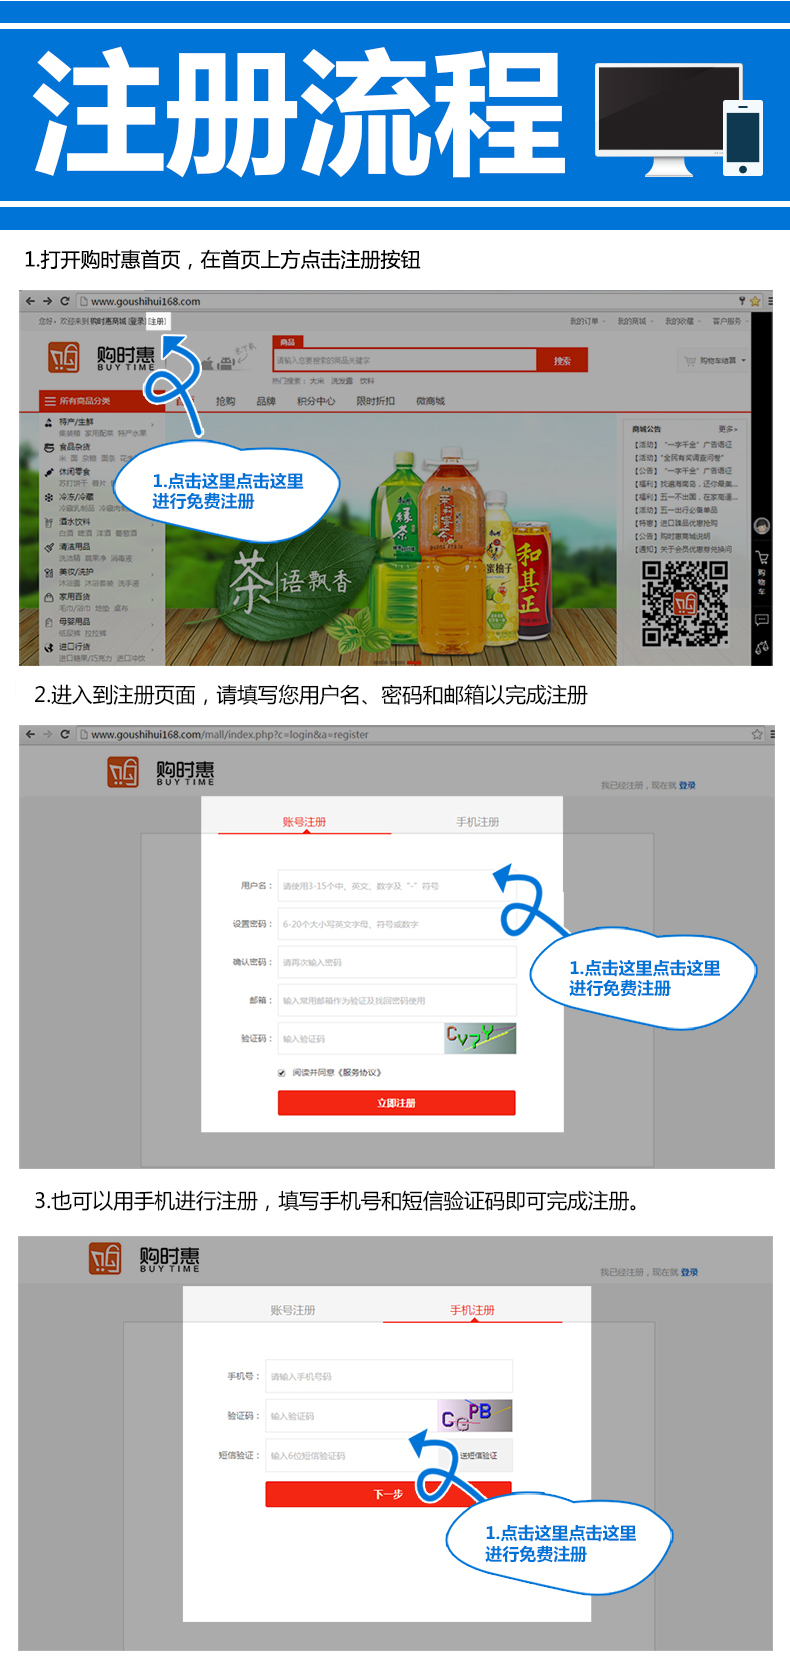 http://www.goushihui168.com/data/upload/mall/article/05168944273163408.jpg